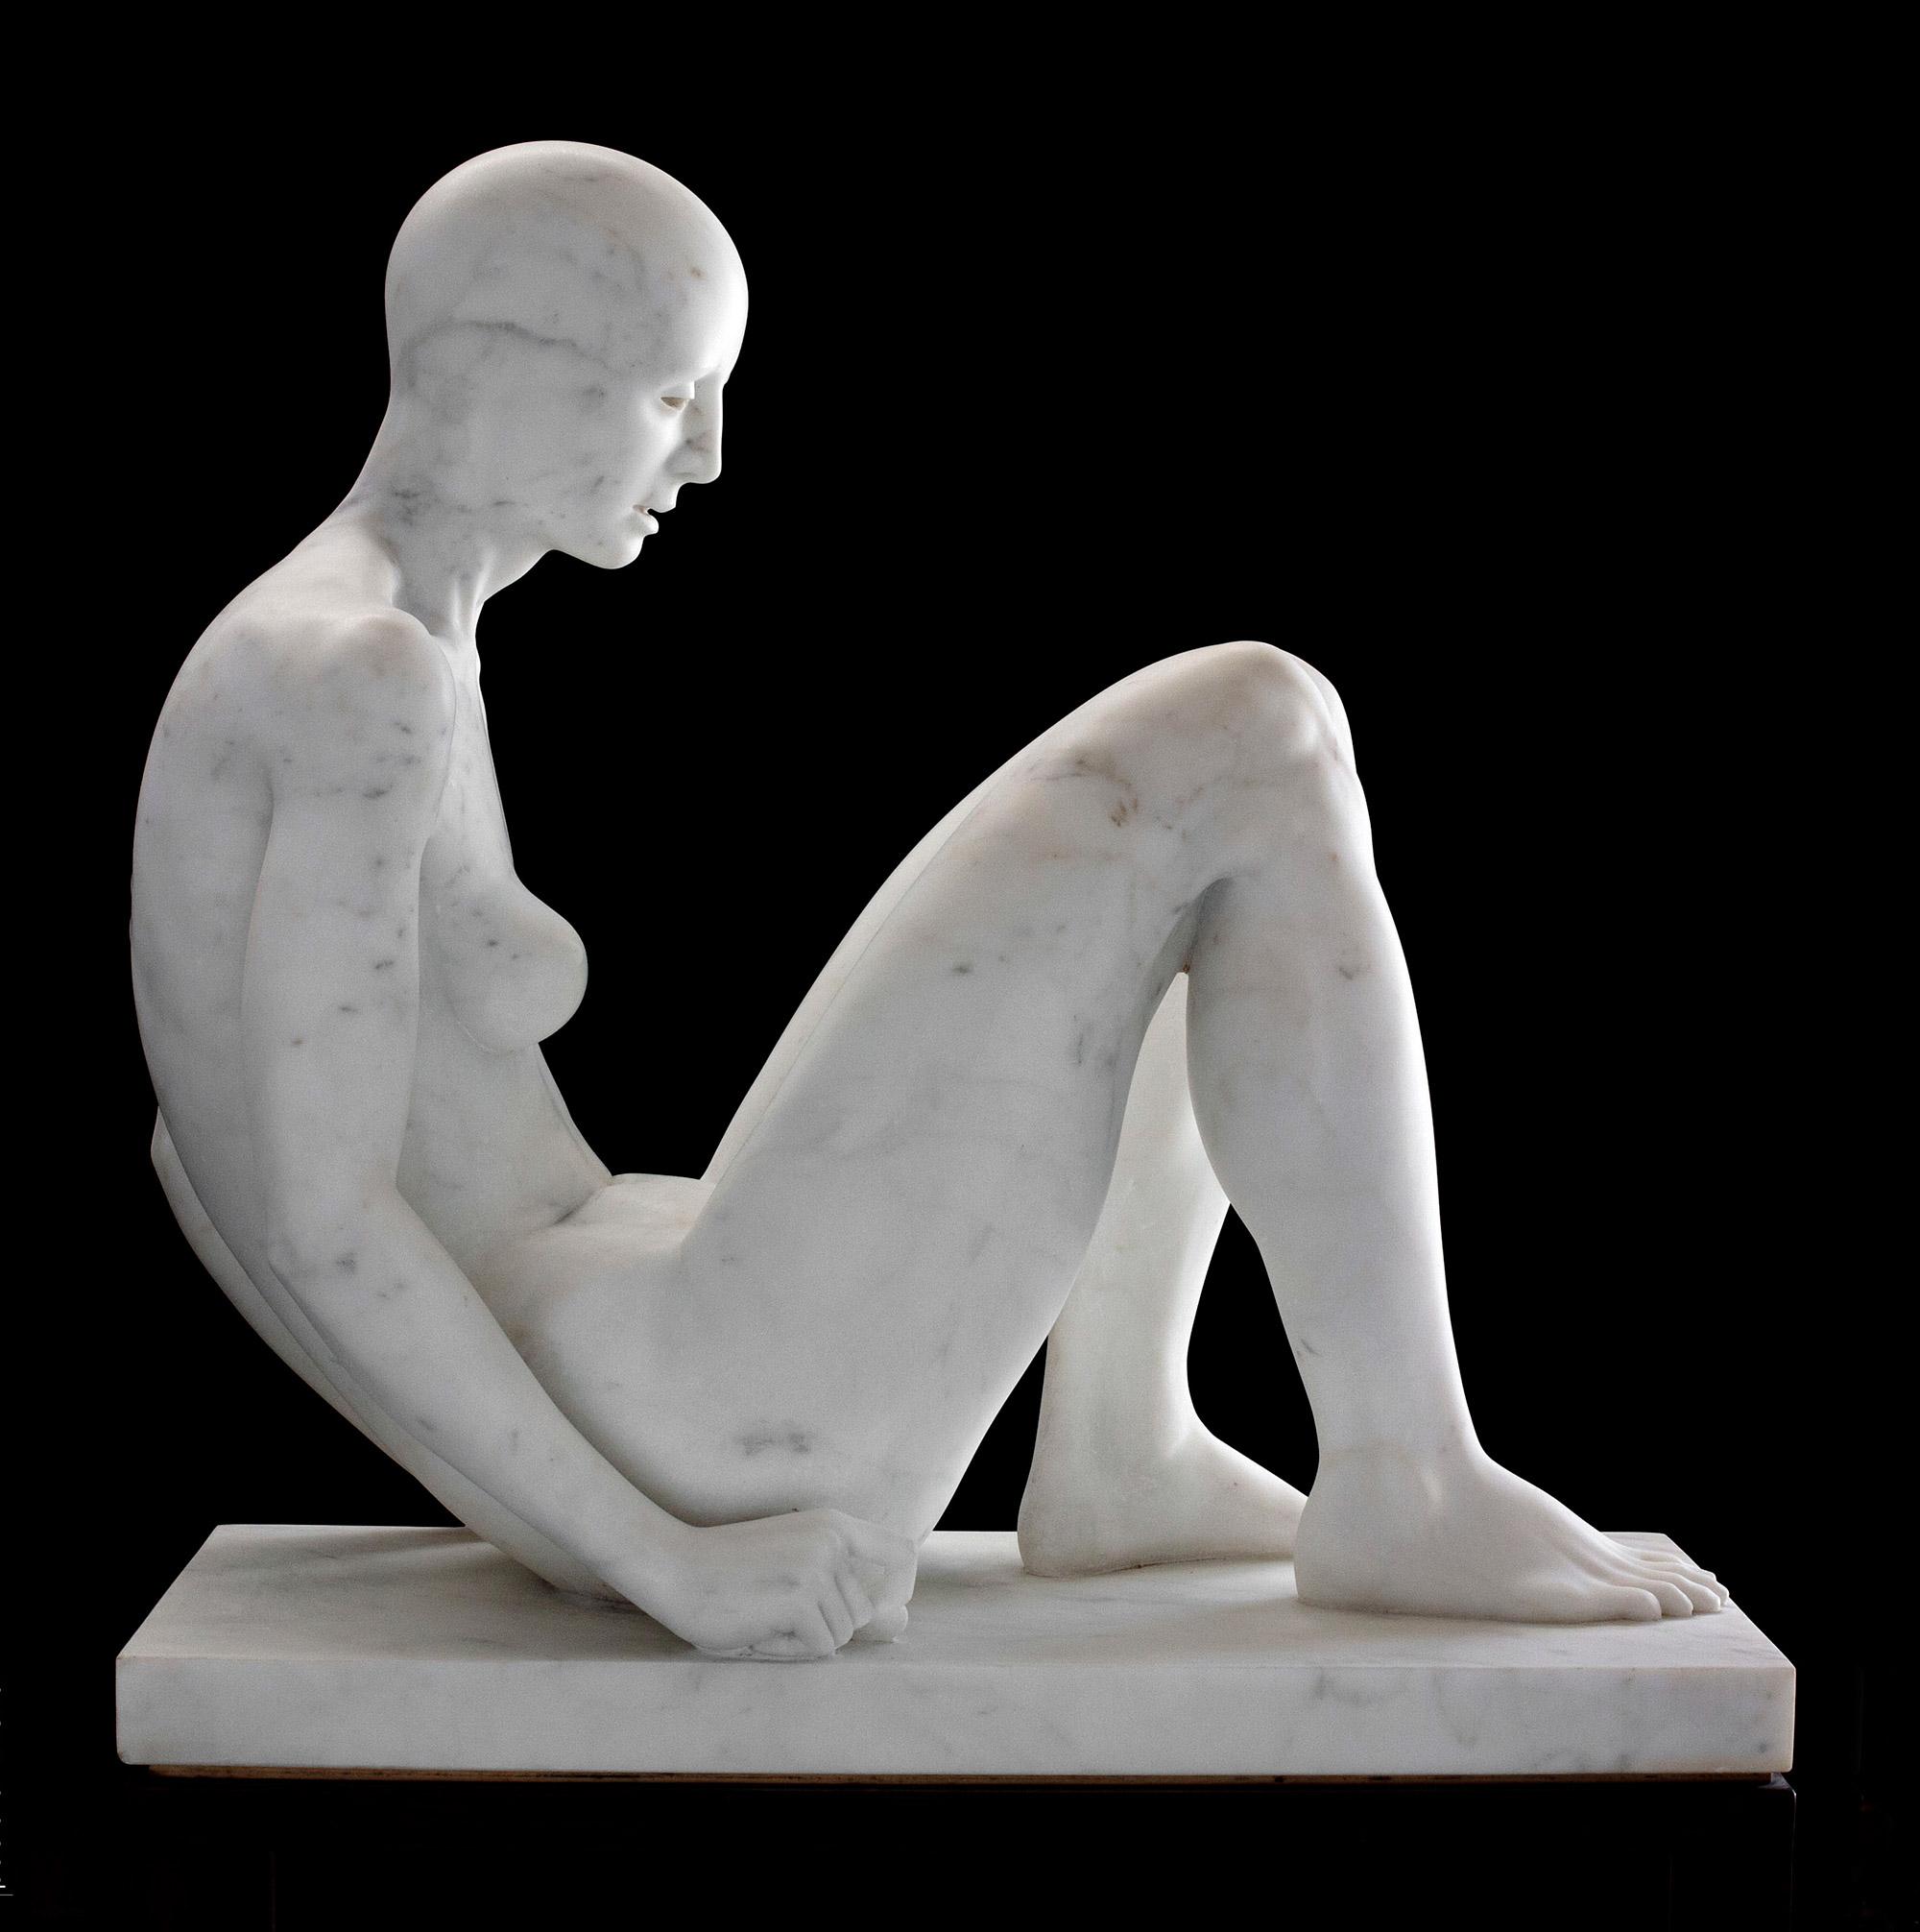 Alessandro-Lombardo-Figurative-Marble-Sculpture-3.jpg